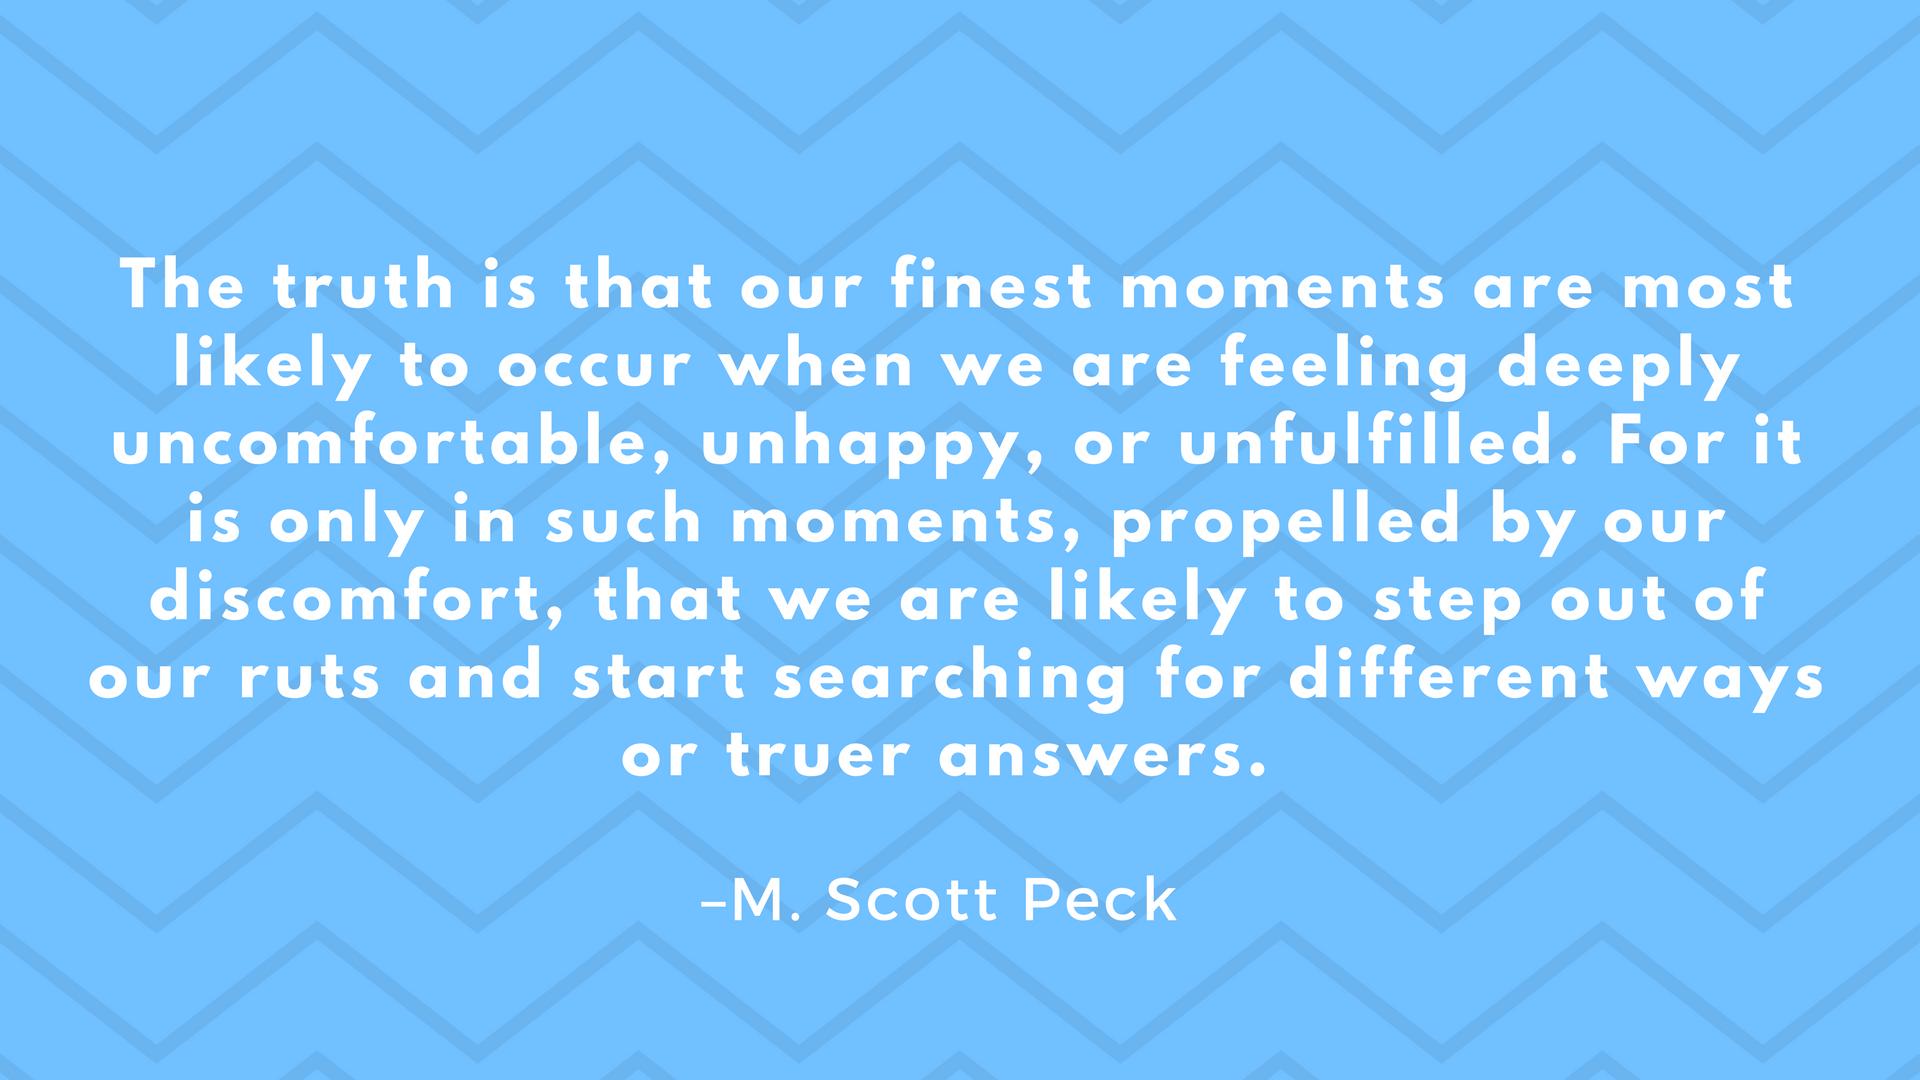 Scott Peck quote